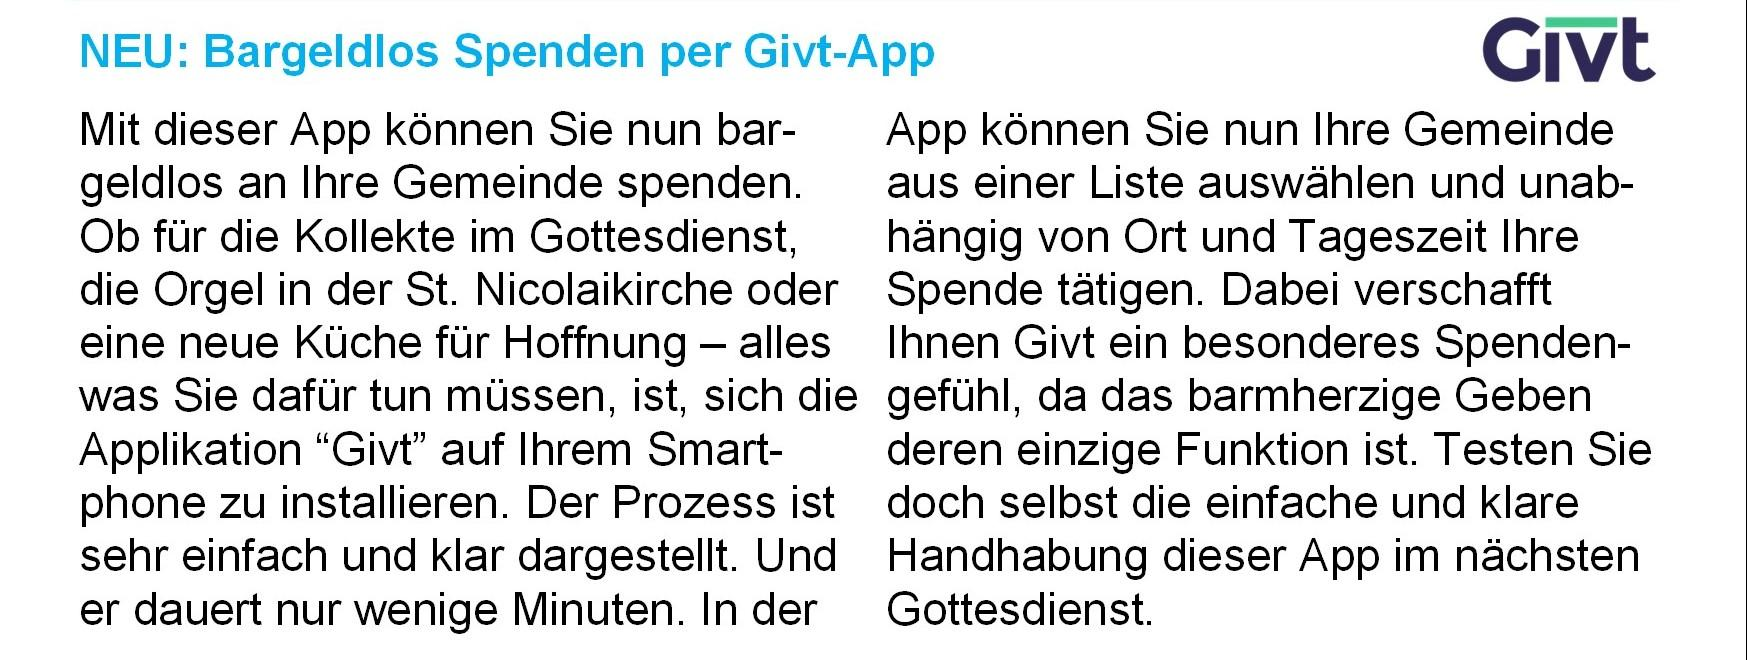 Givt-App